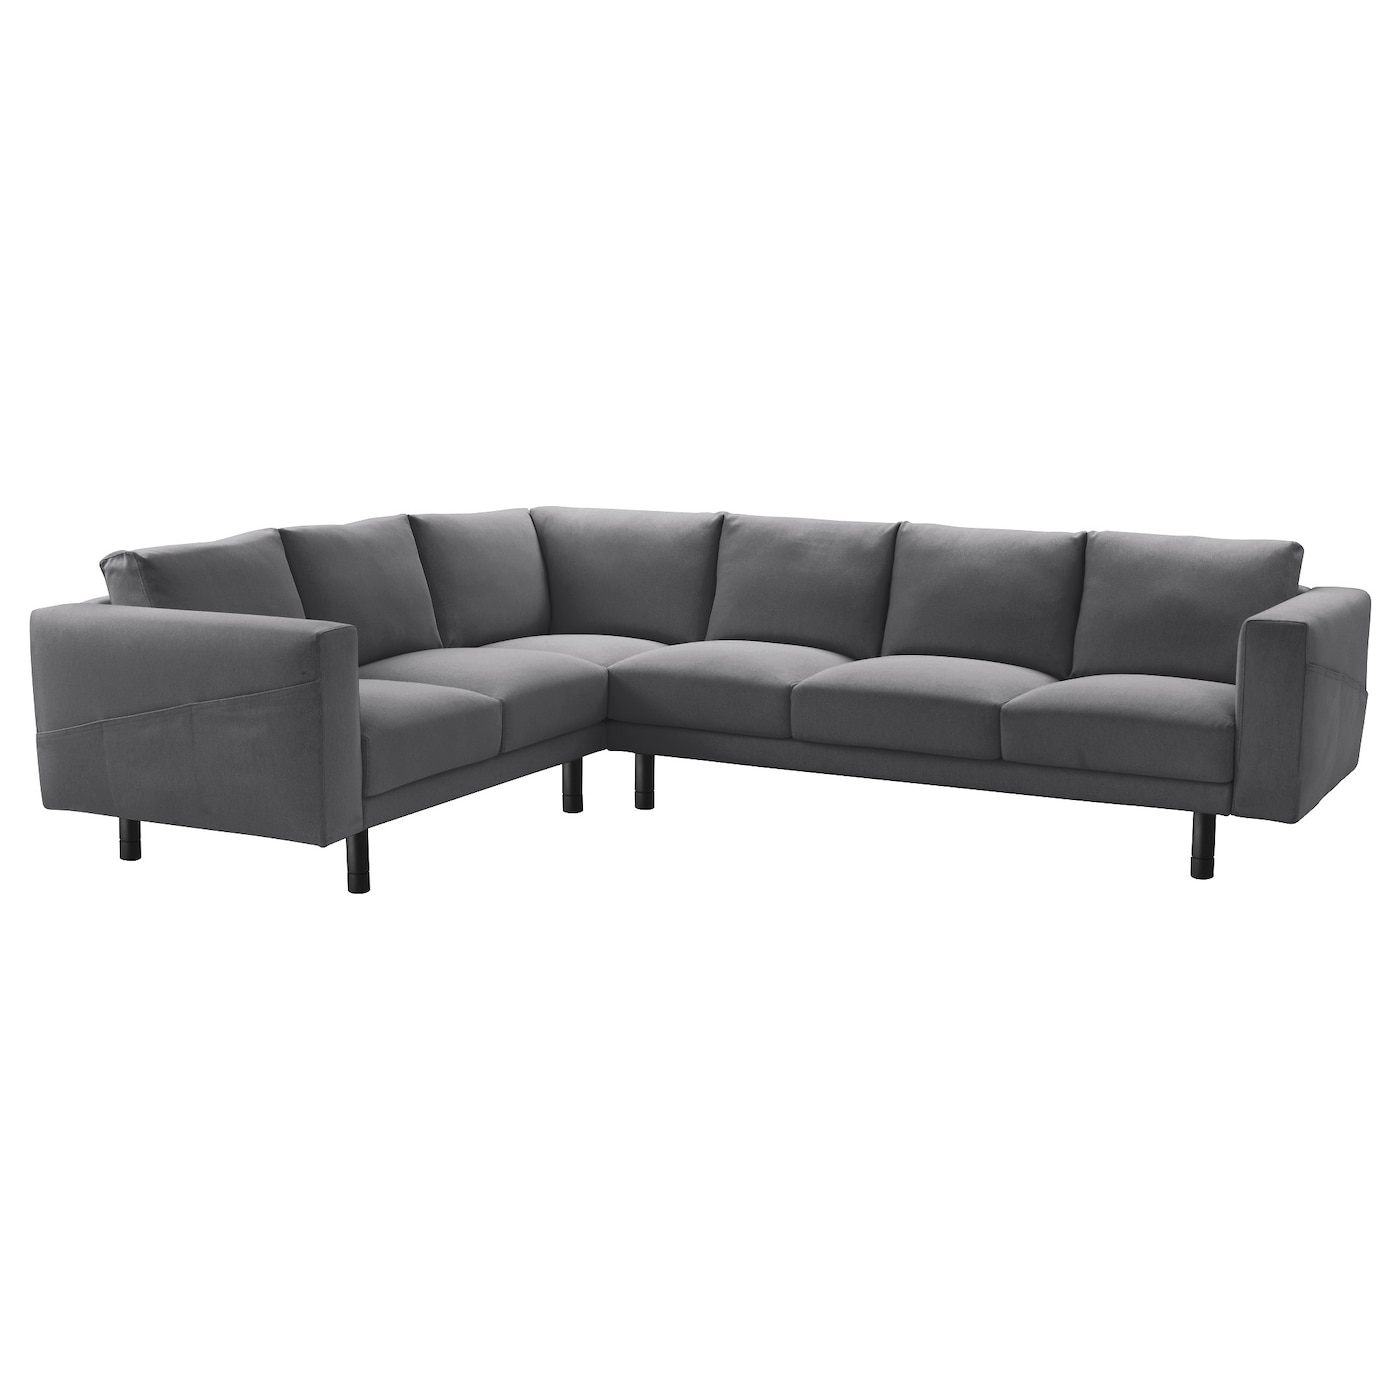 Norsborg Corner Sofa 2 3 3 2 Finnsta Dark Grey Grey Ikea